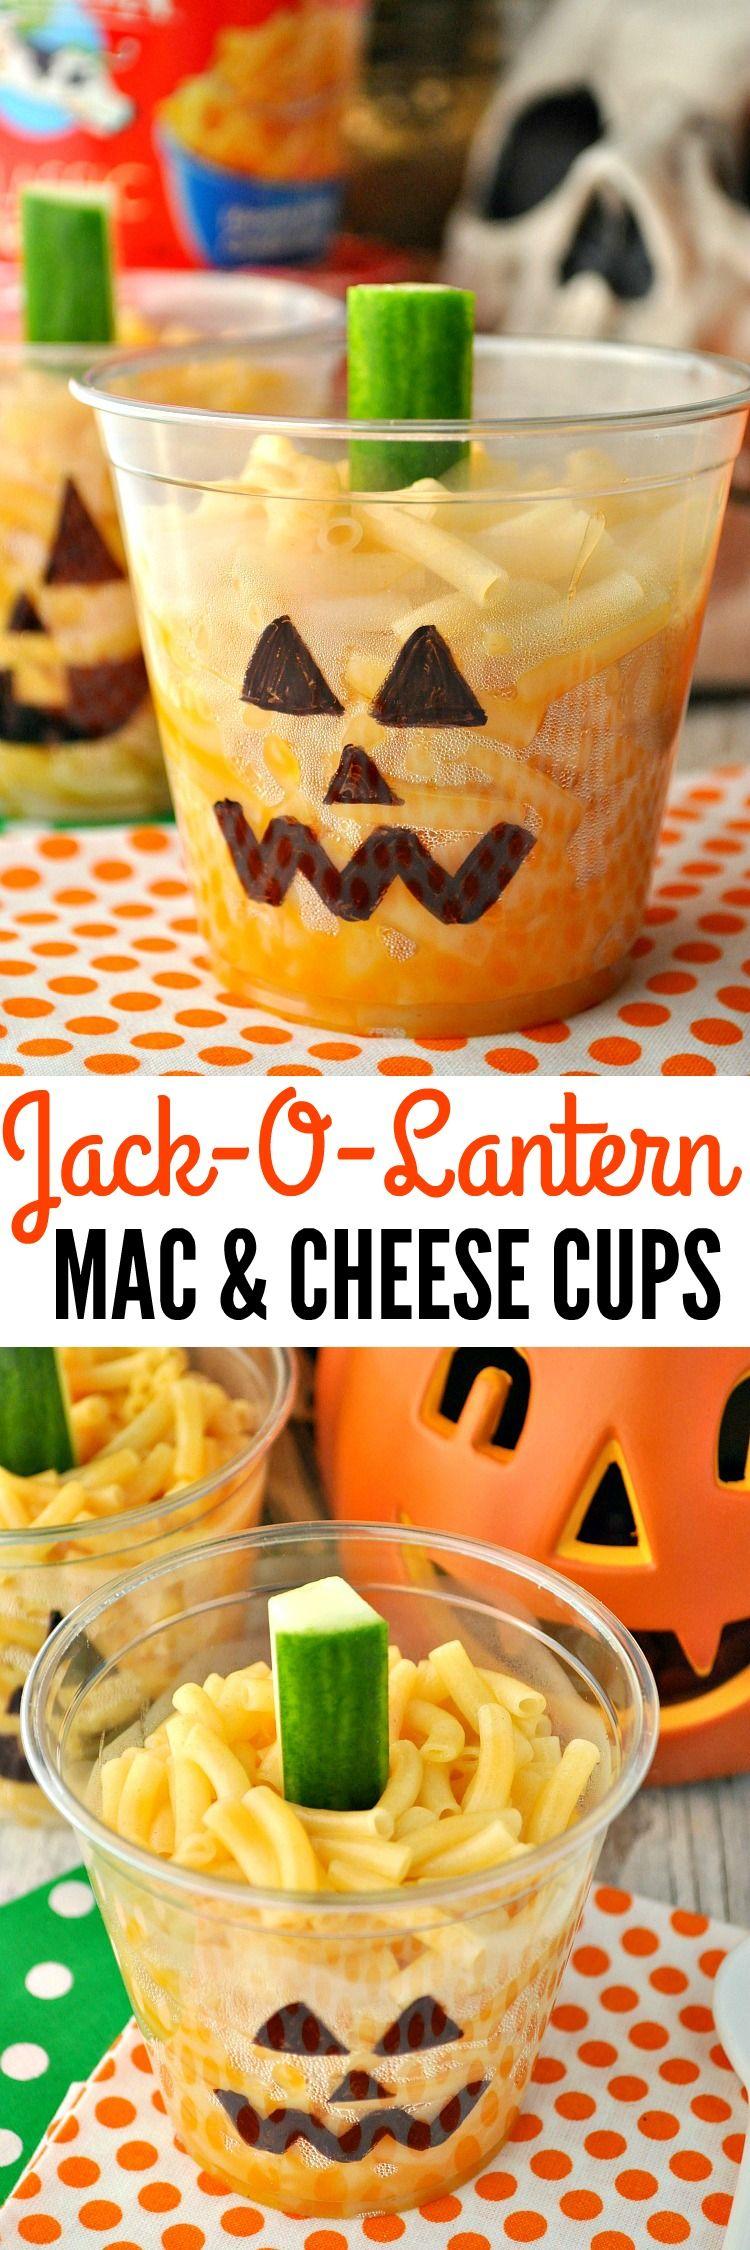 Jack-O-Lantern Mac and Cheese Cups | Recipe | Easy halloween ...